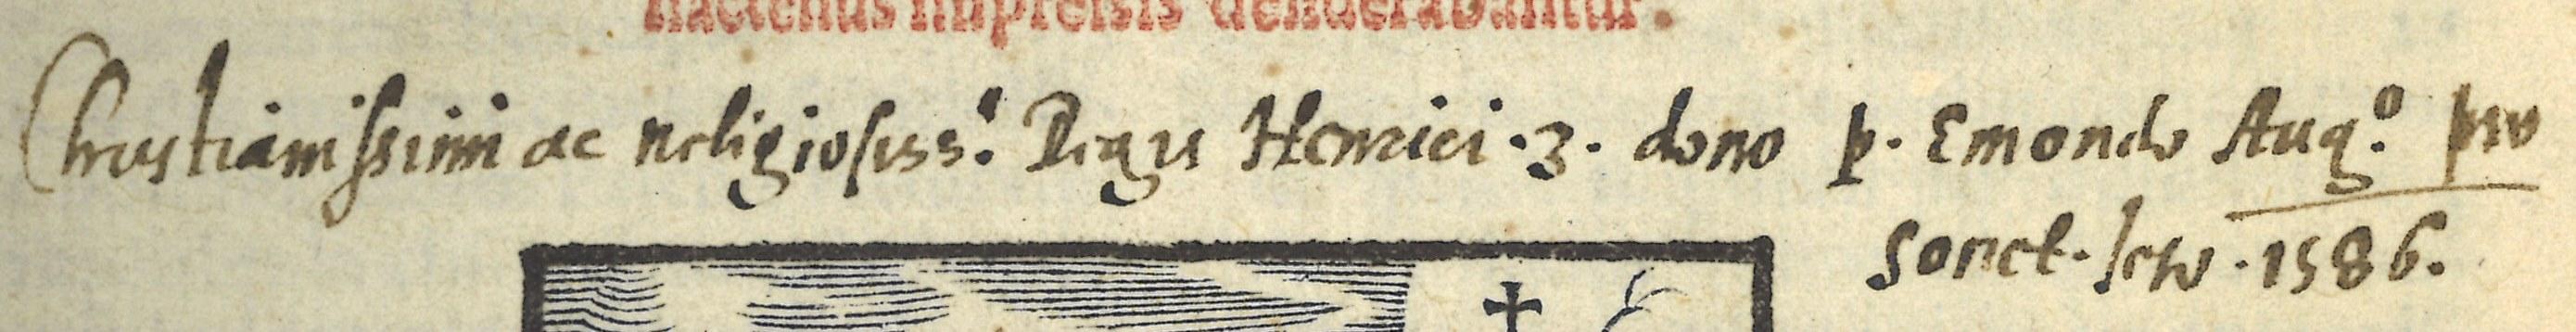 "Ex dono manuscrito: ""Christianissimi ac religiosiss. Regis Henrici 3 dono p. Emondo Augº. pro Societ. Iesu 1586"""